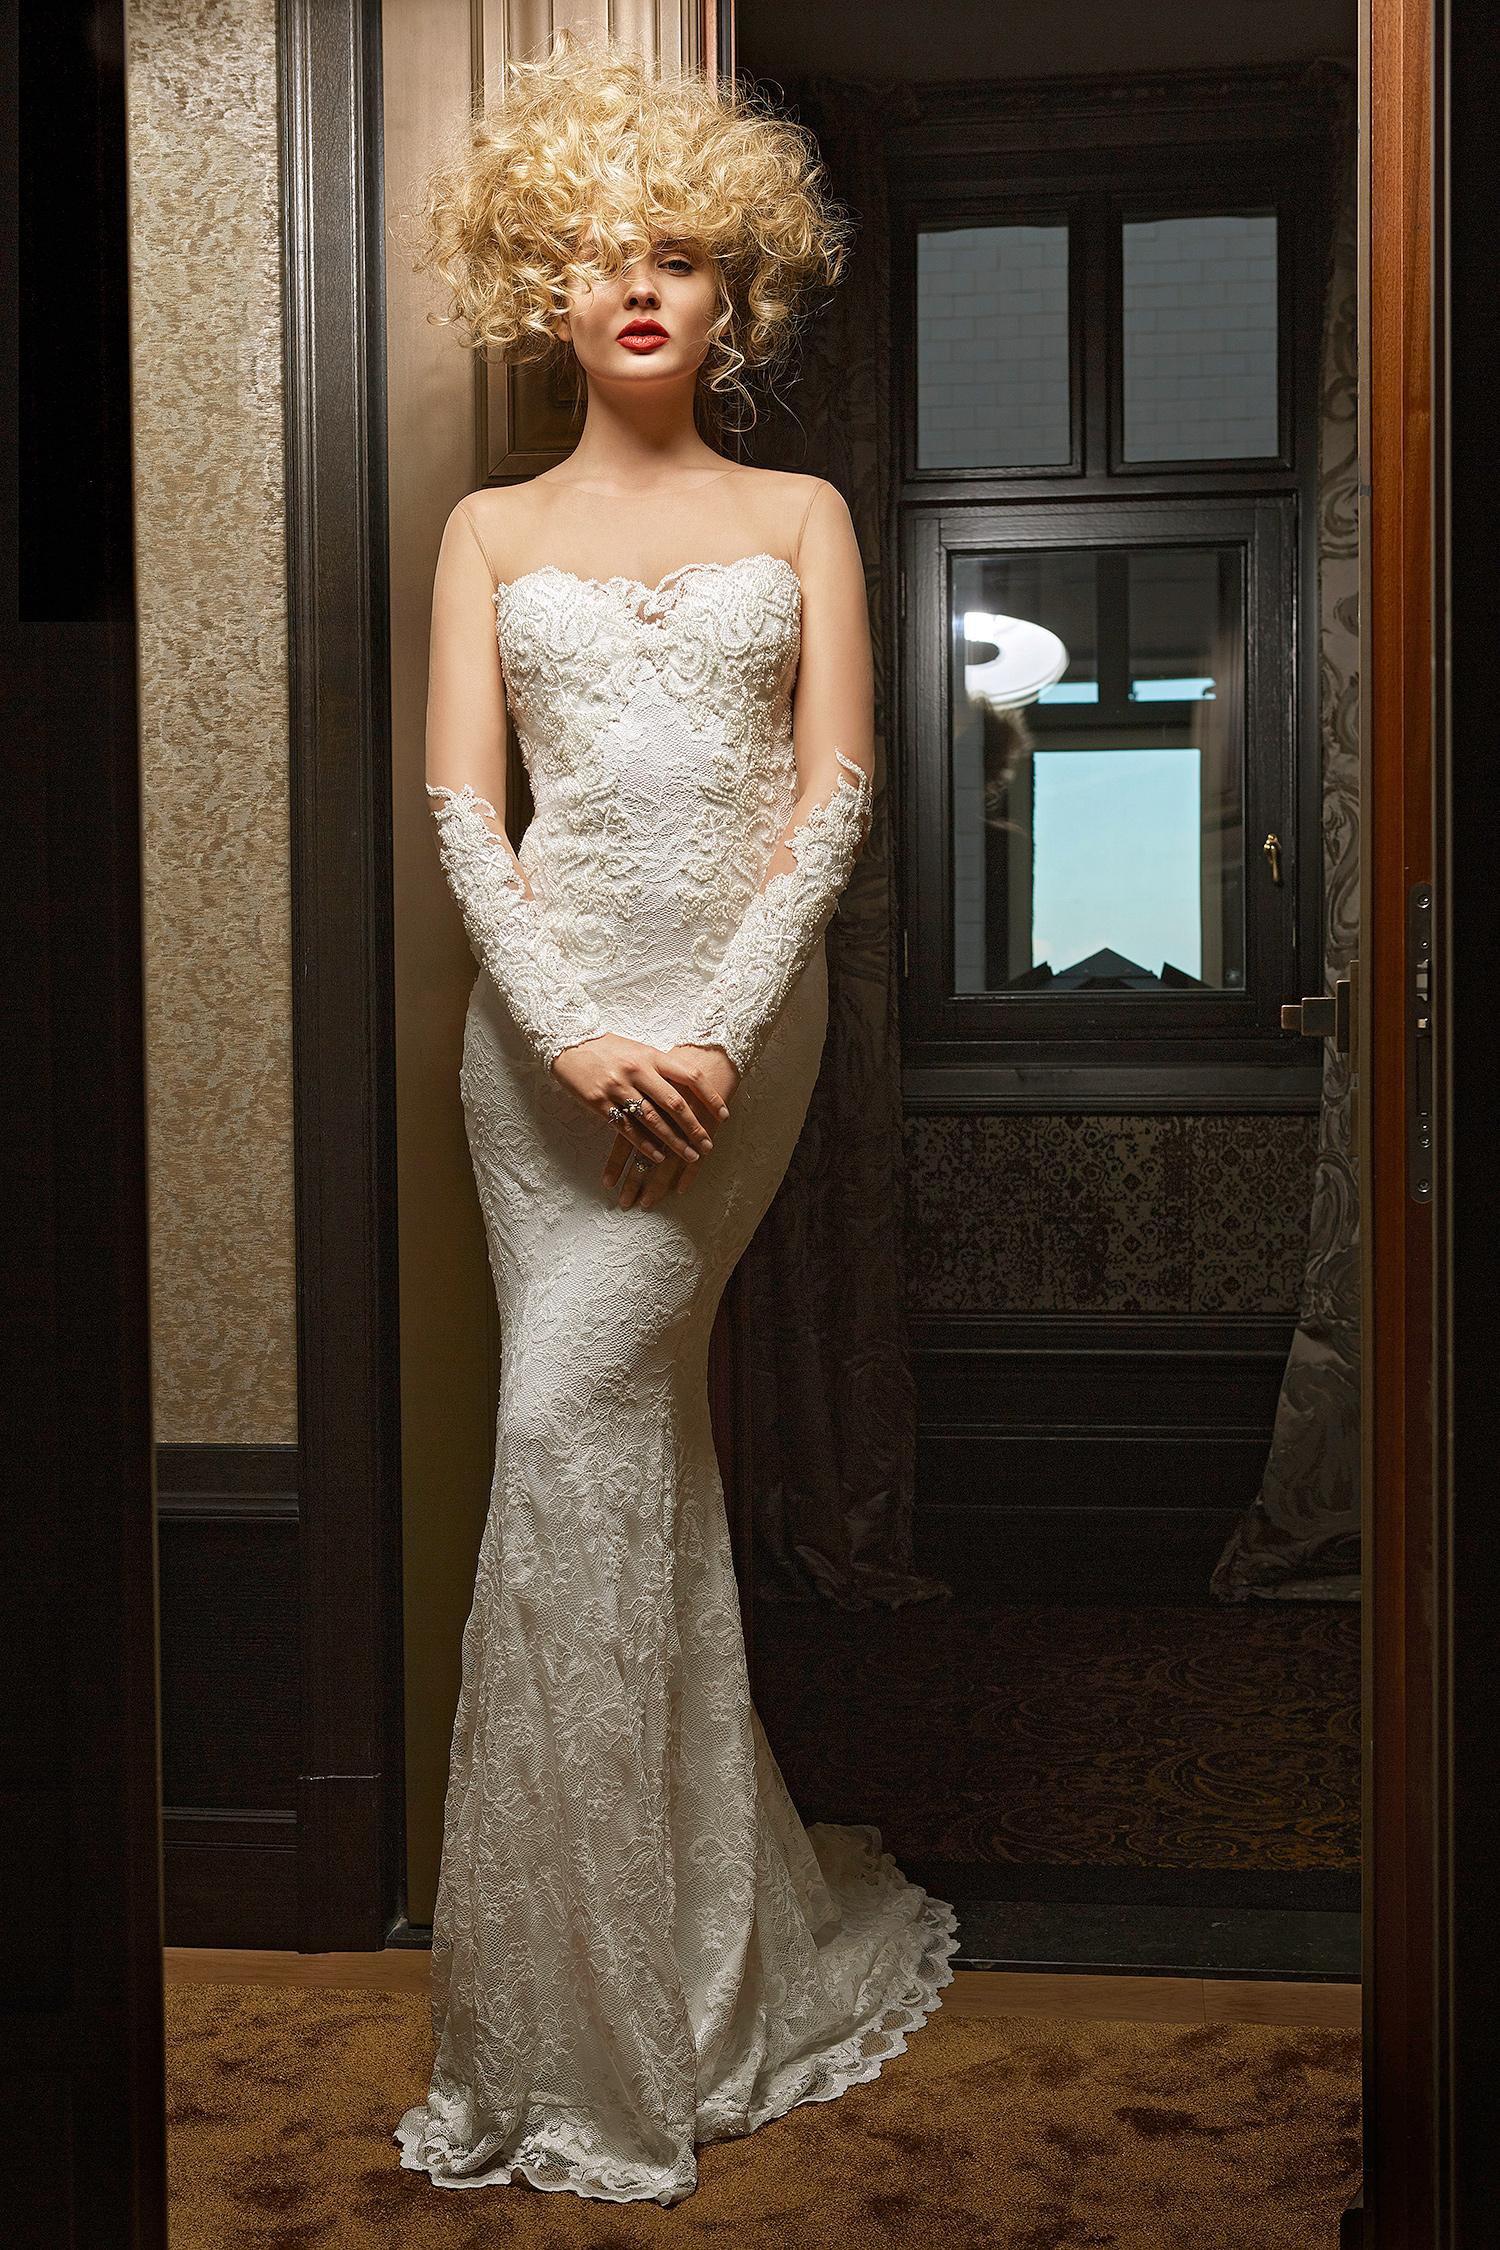 olvi wedding dress spring 2019 illusion neck long-sleeves detail